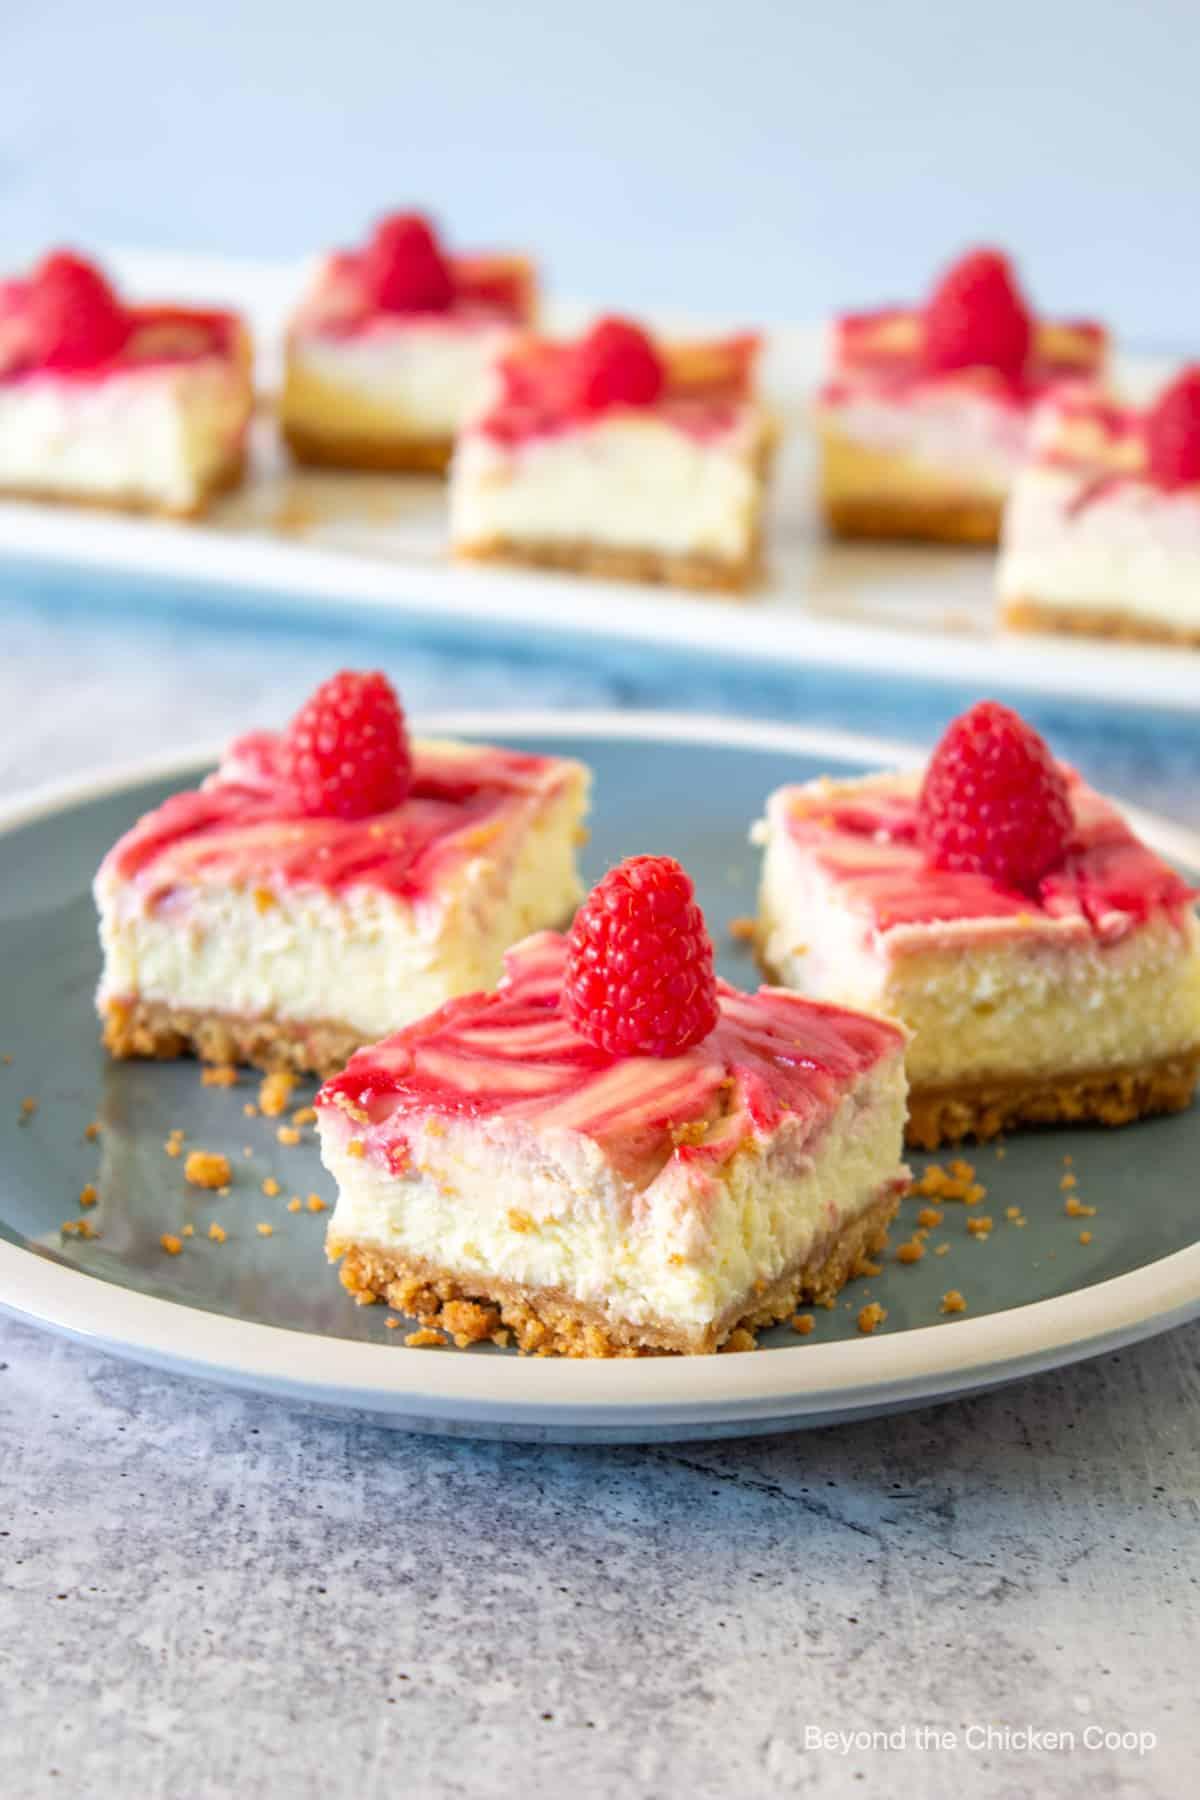 Three cheesecake bars topped with fresh raspberries.